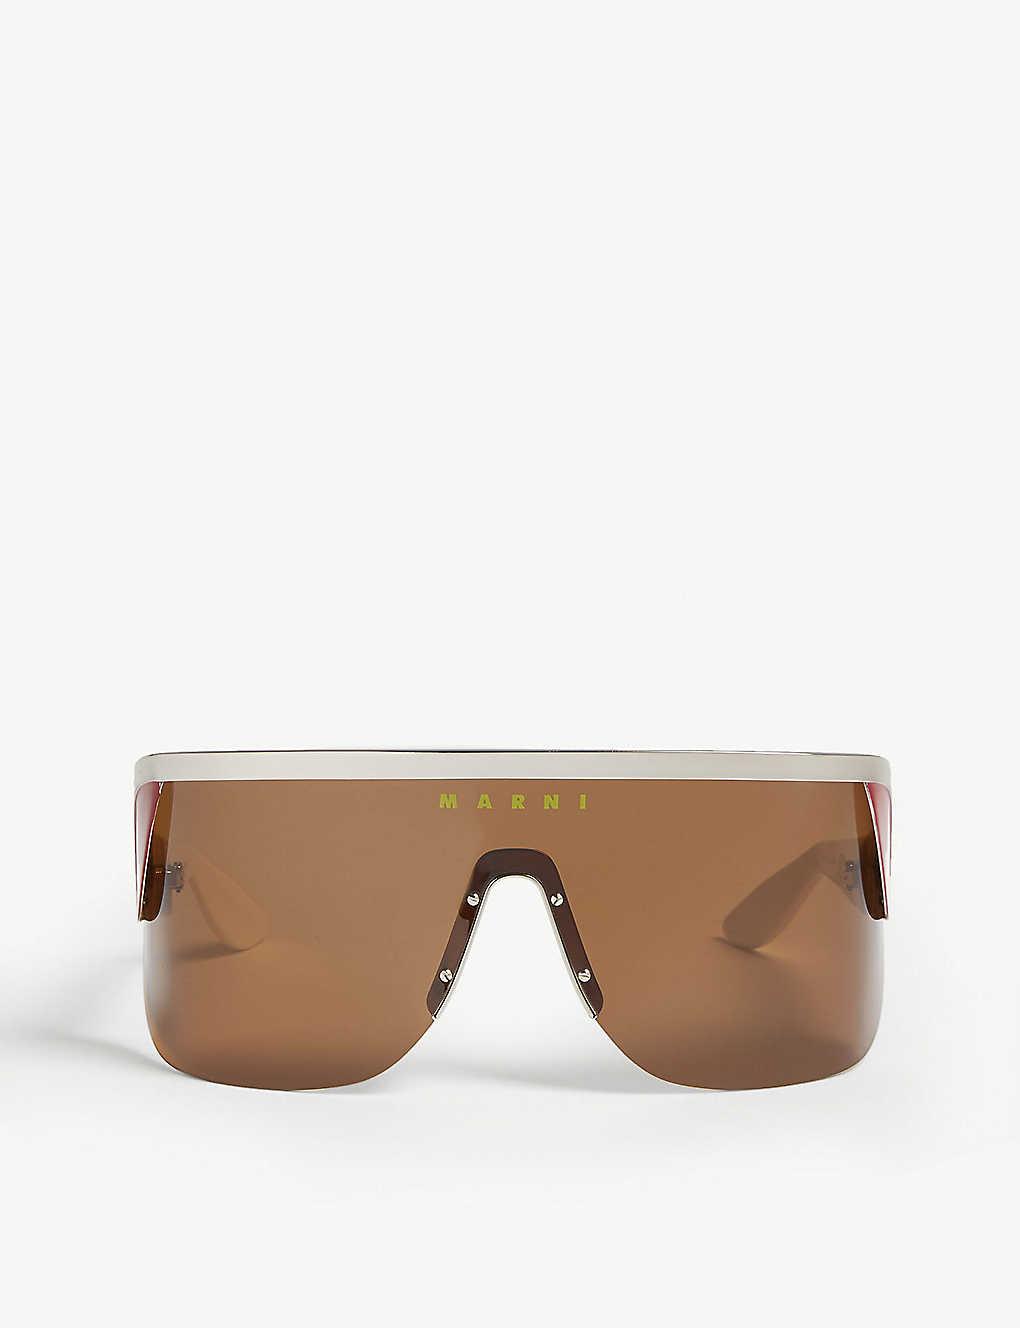 Marni Sunglasses ME111S shield sunglasses